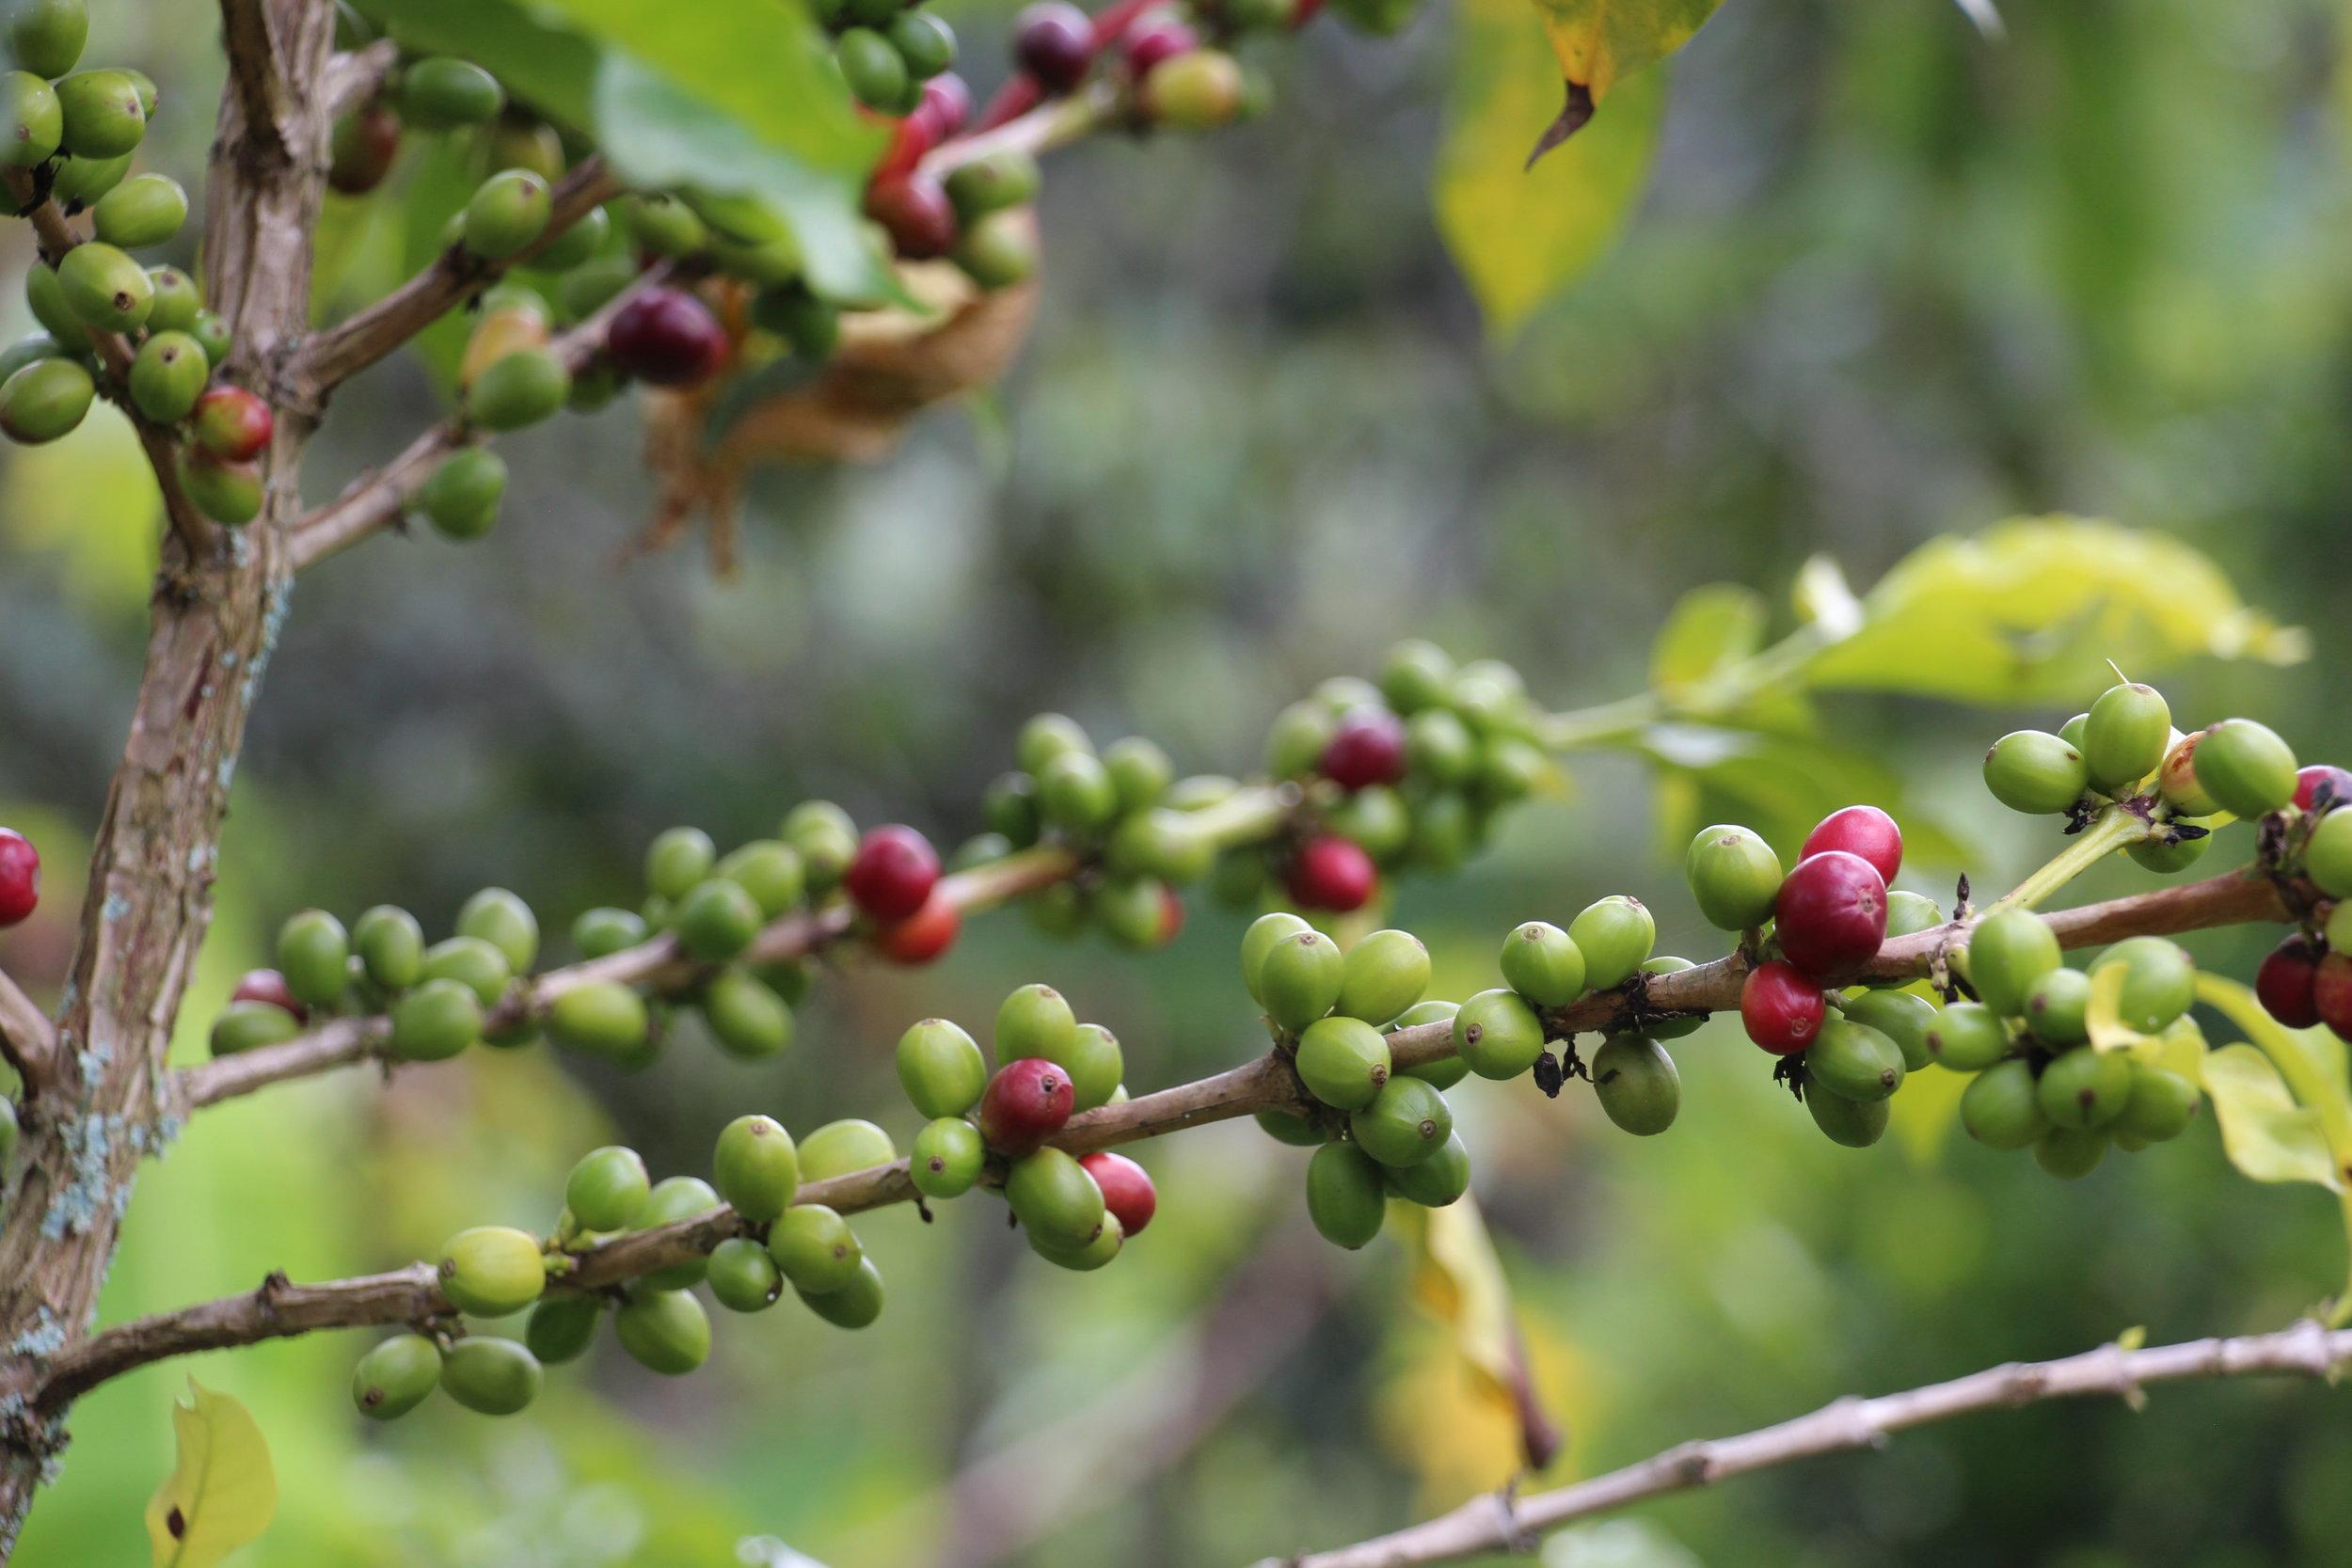 Coffee ripening